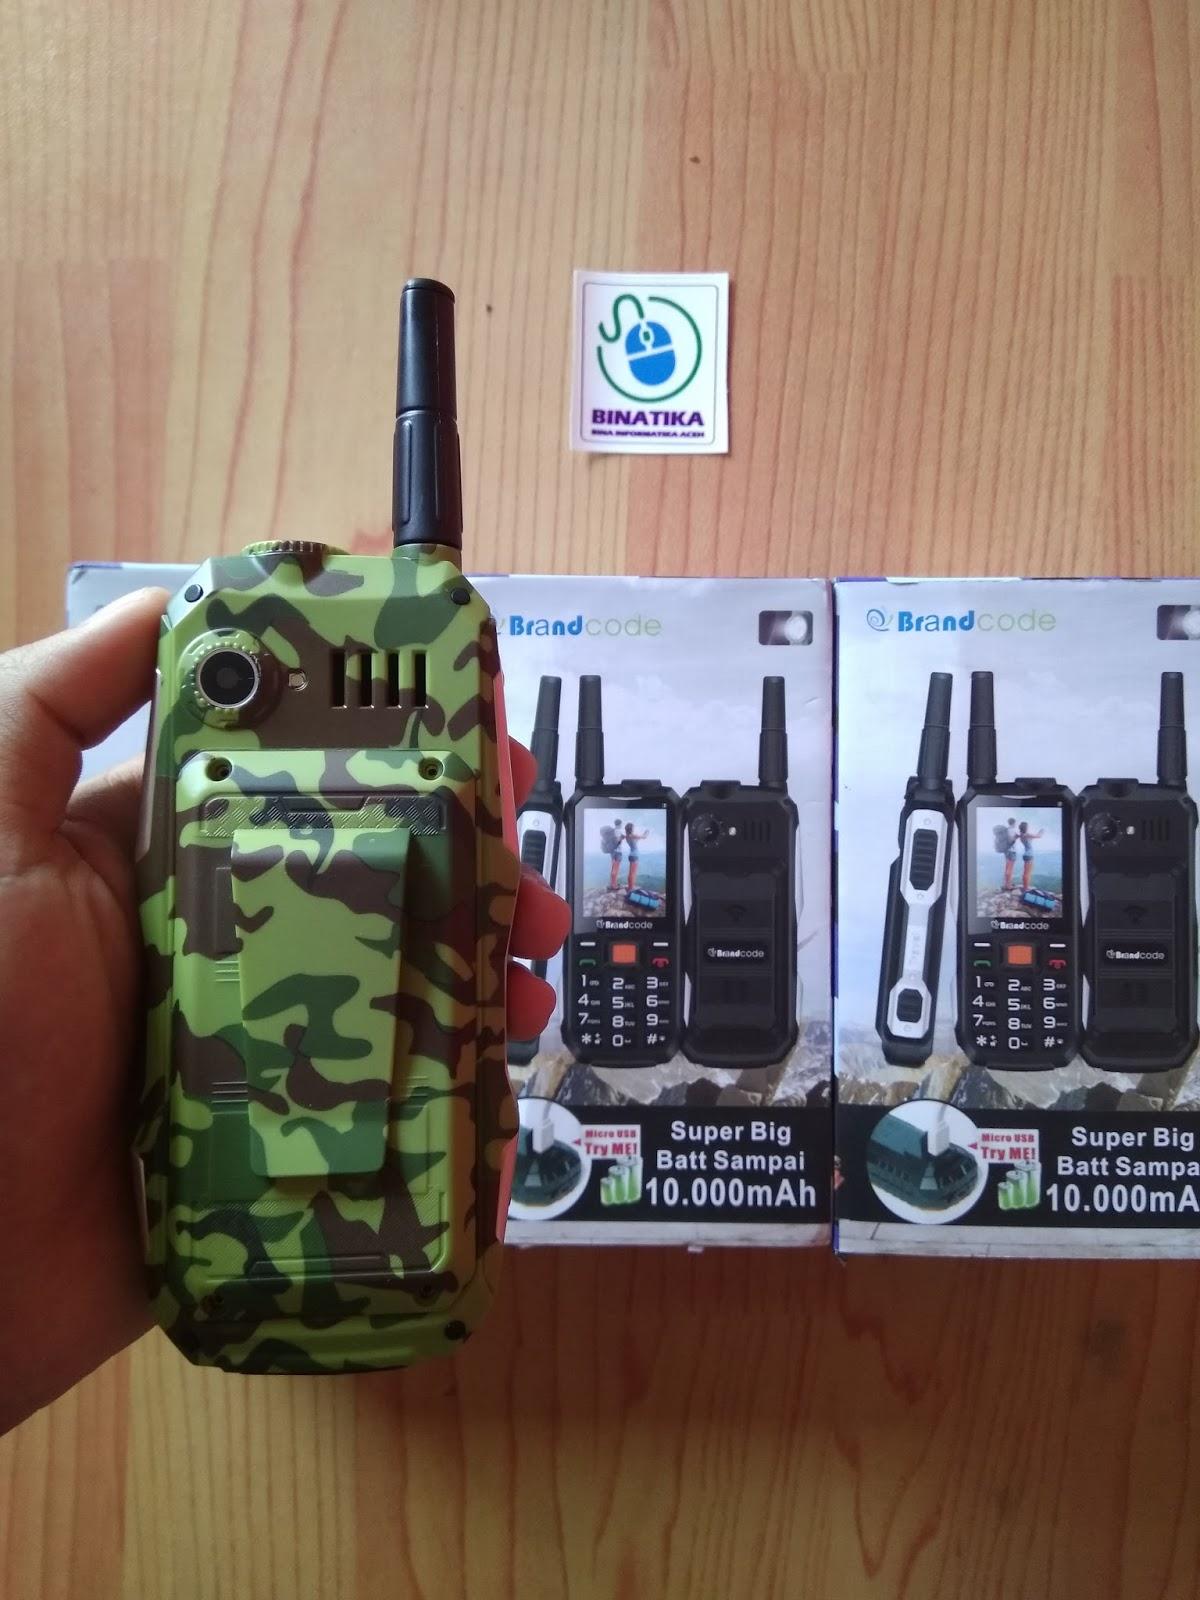 Brandcode B81 Model Loreng Army Baterai 10000 Mah Bisa Powerbank Binatika Shop